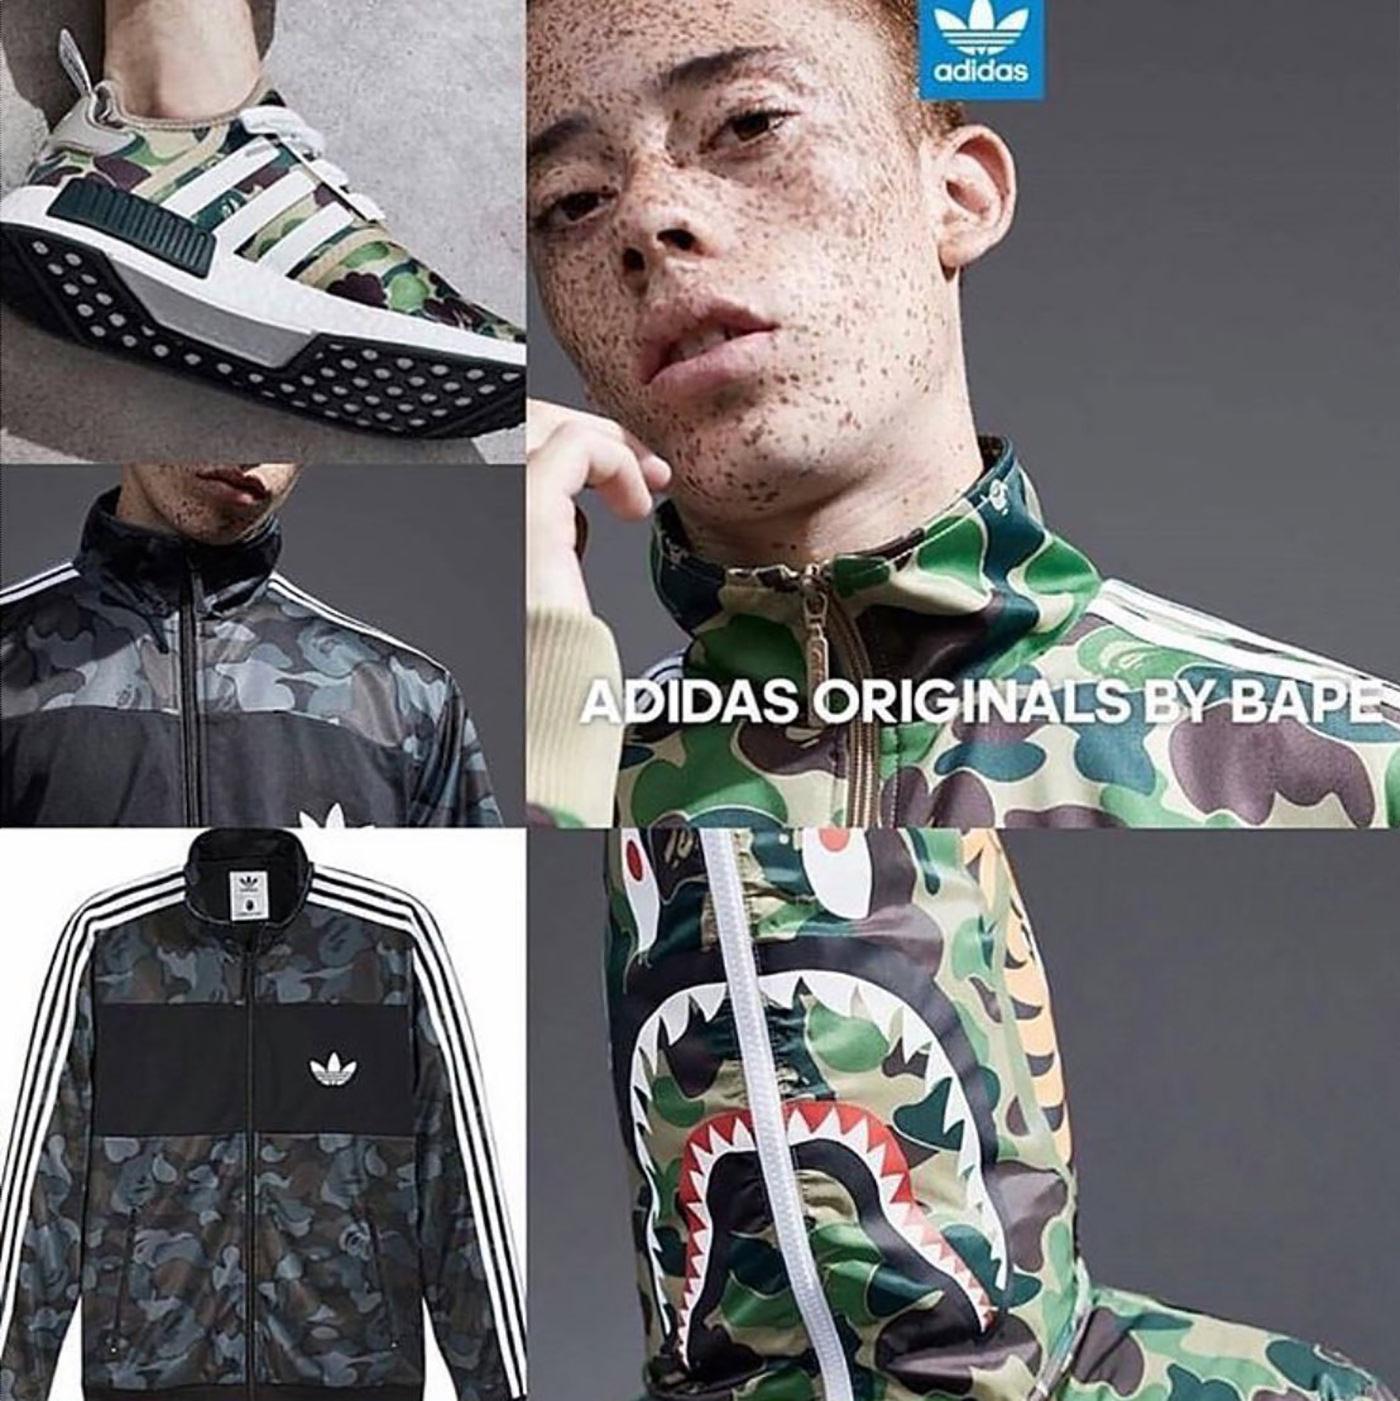 582a936a8758d1796d325acf_bape-adidas-collab-5